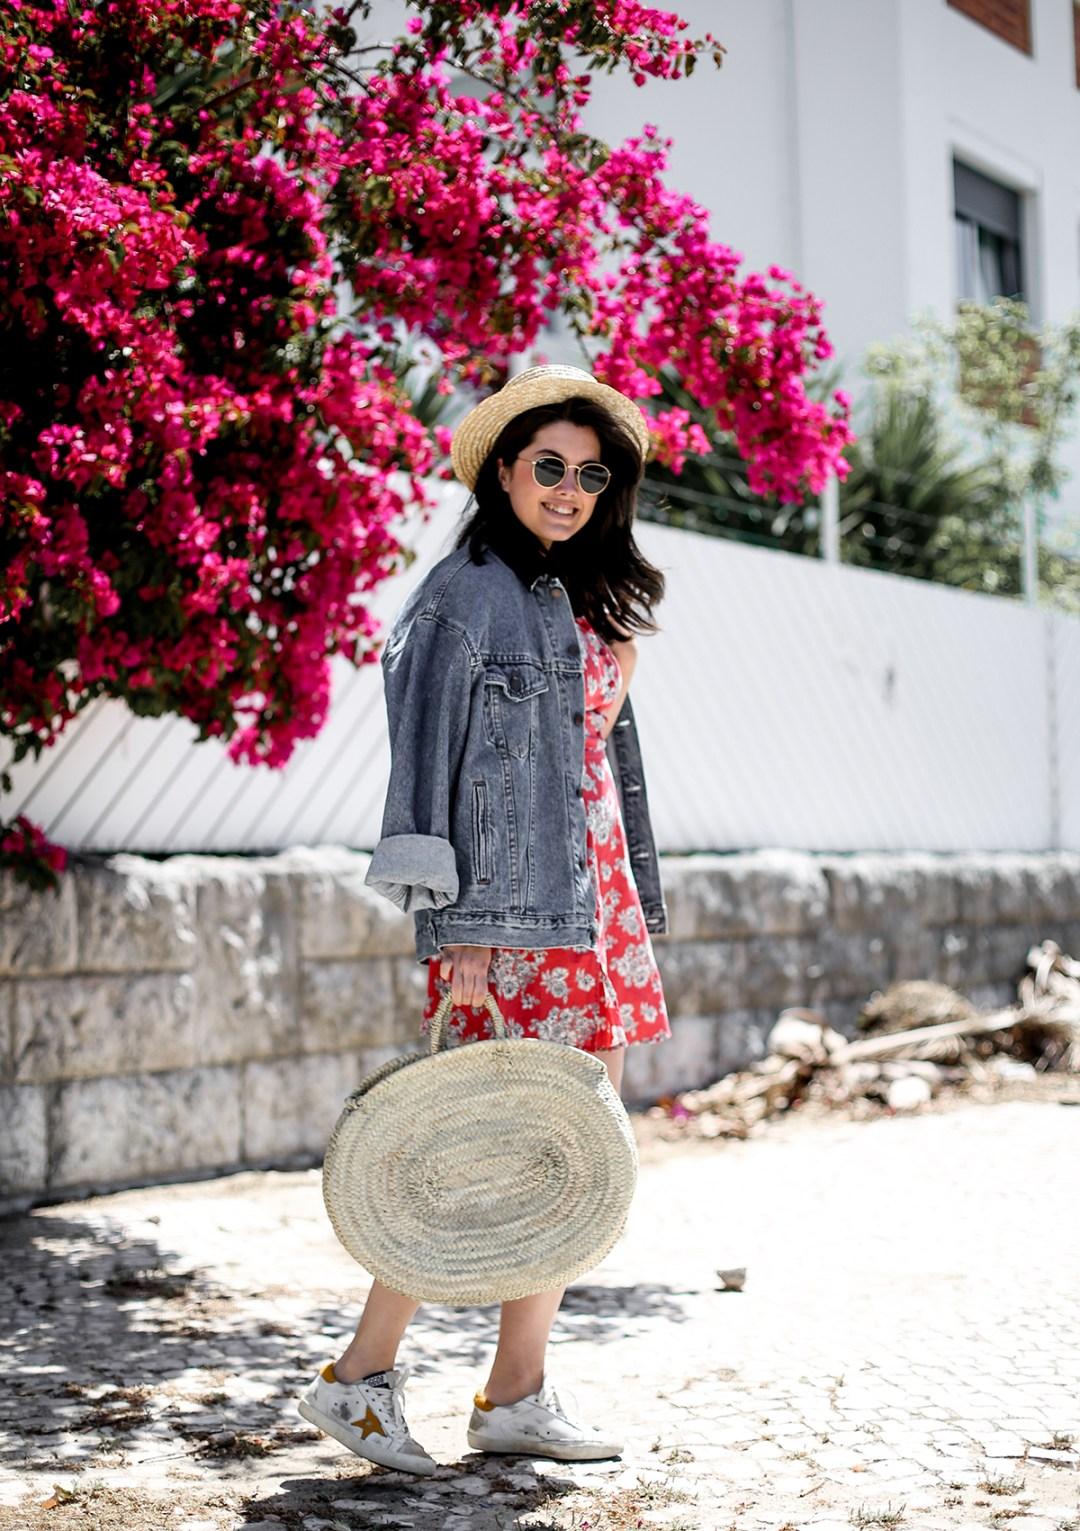 golden-goose-deluxe-brand-red-dress-asos-costa-caparica-spring-summer-myblueberrynightsblog10